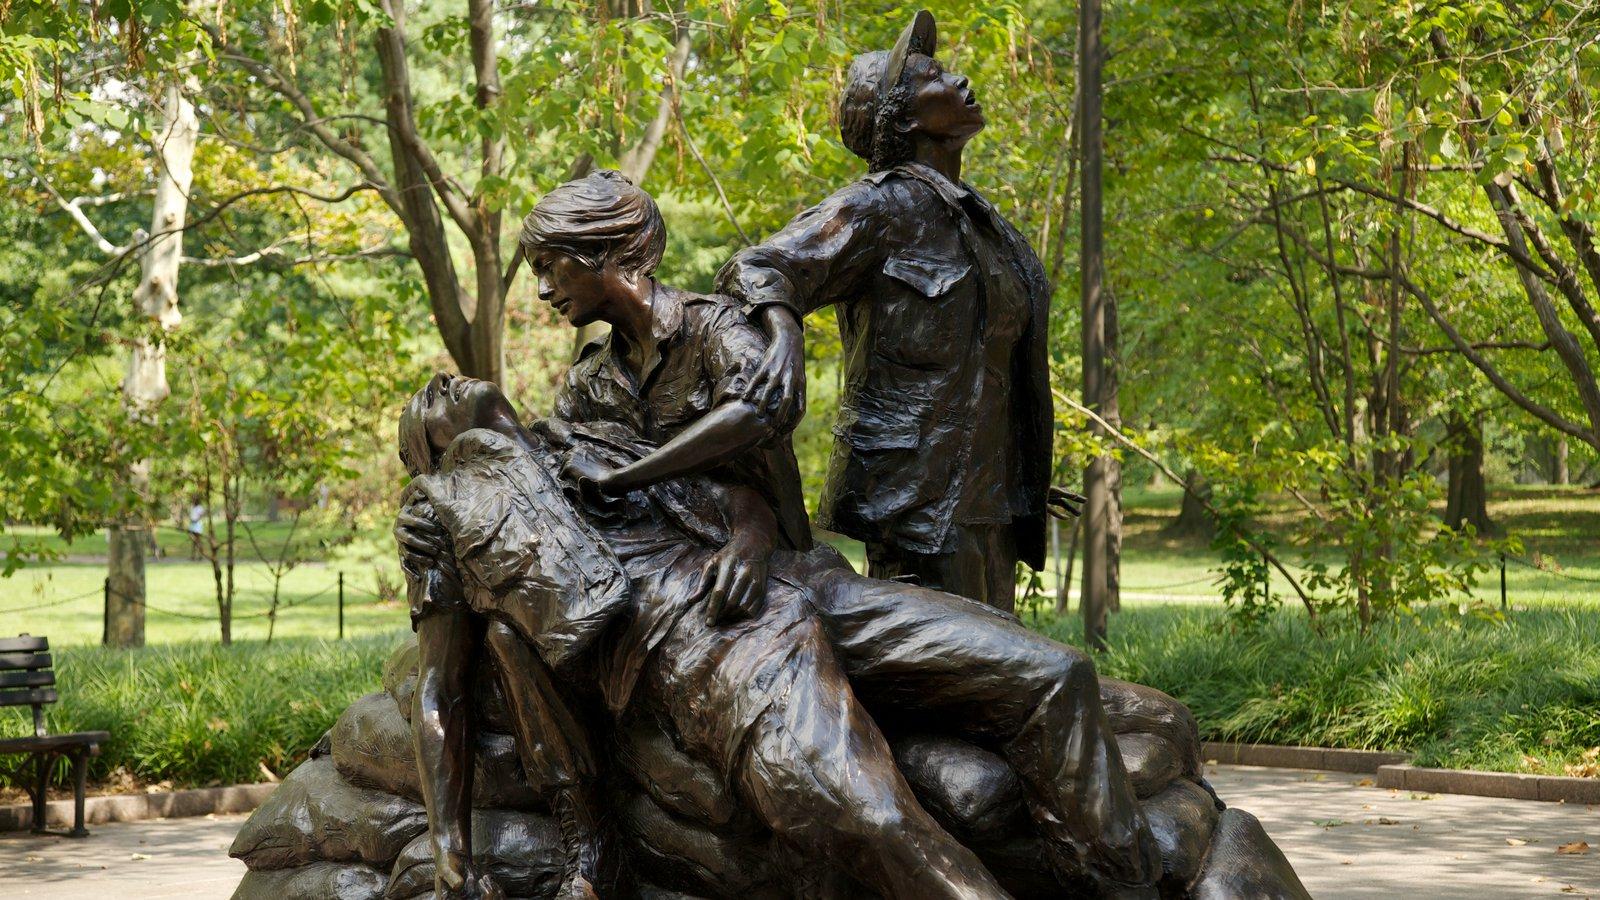 Vietnam Veterans Memorial featuring a statue or sculpture, a memorial and a park